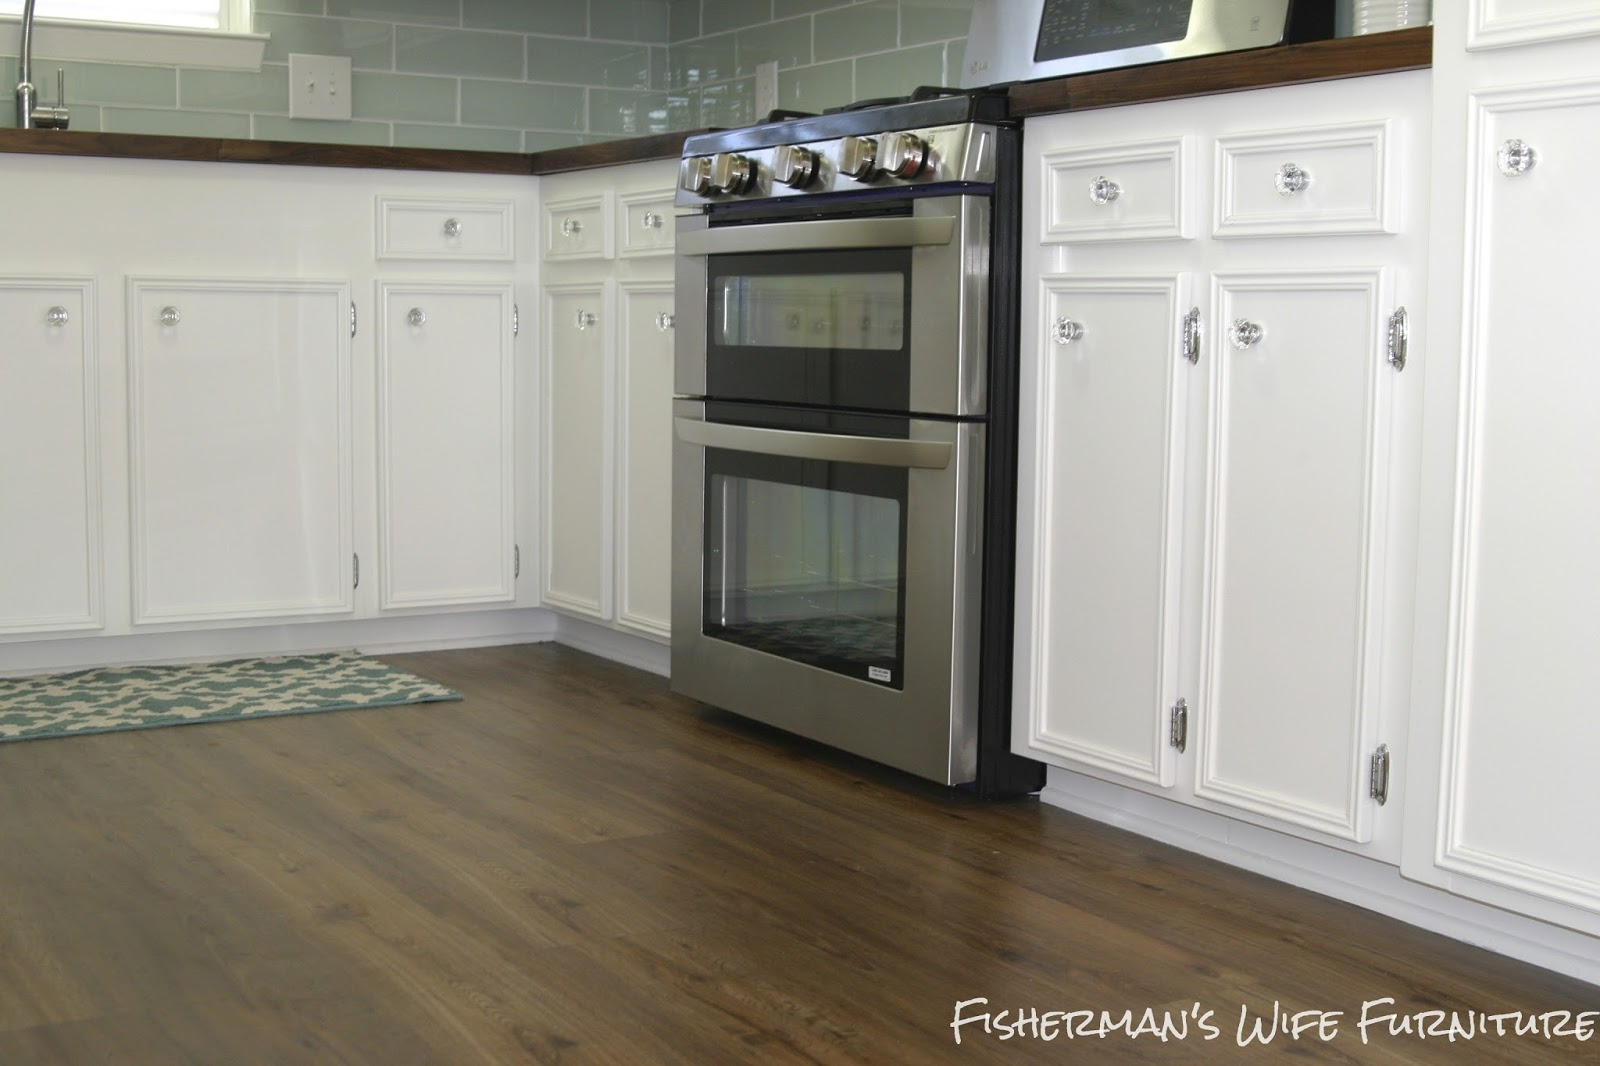 Fisherman S Wife Furniture Kitchen Reveal